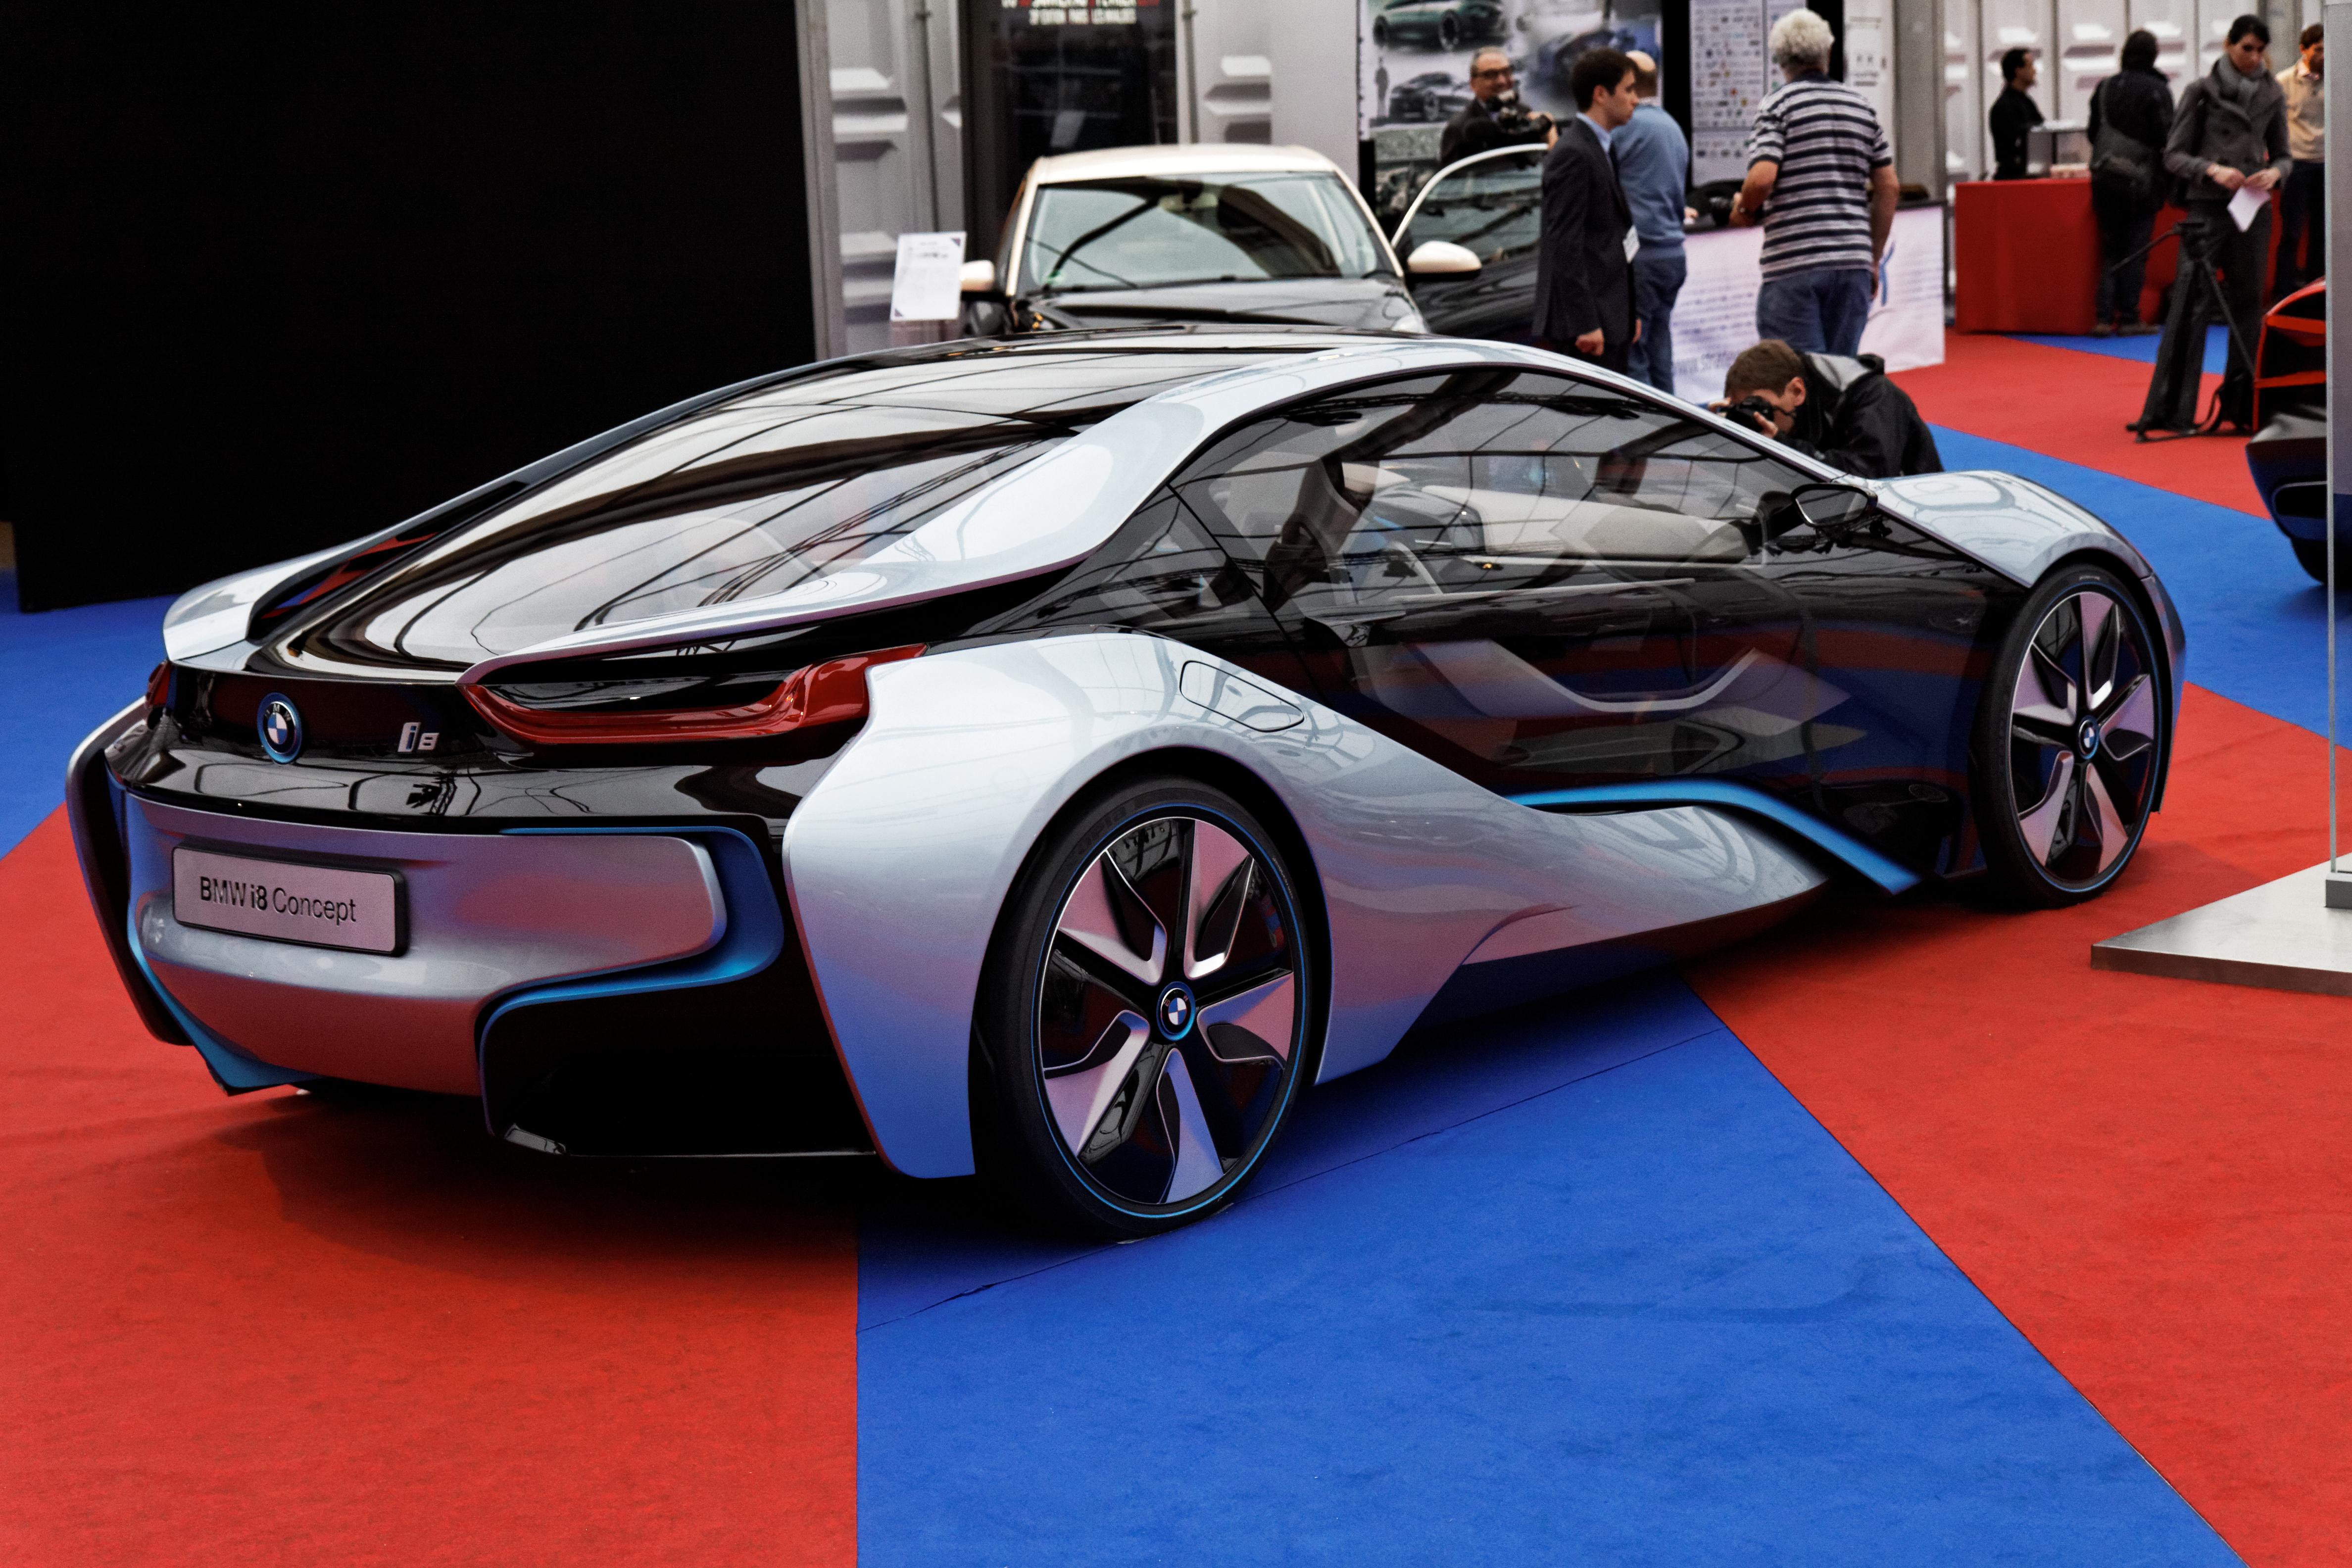 FileFestival Automobile International BMW I Concept - 2013 bmw i8